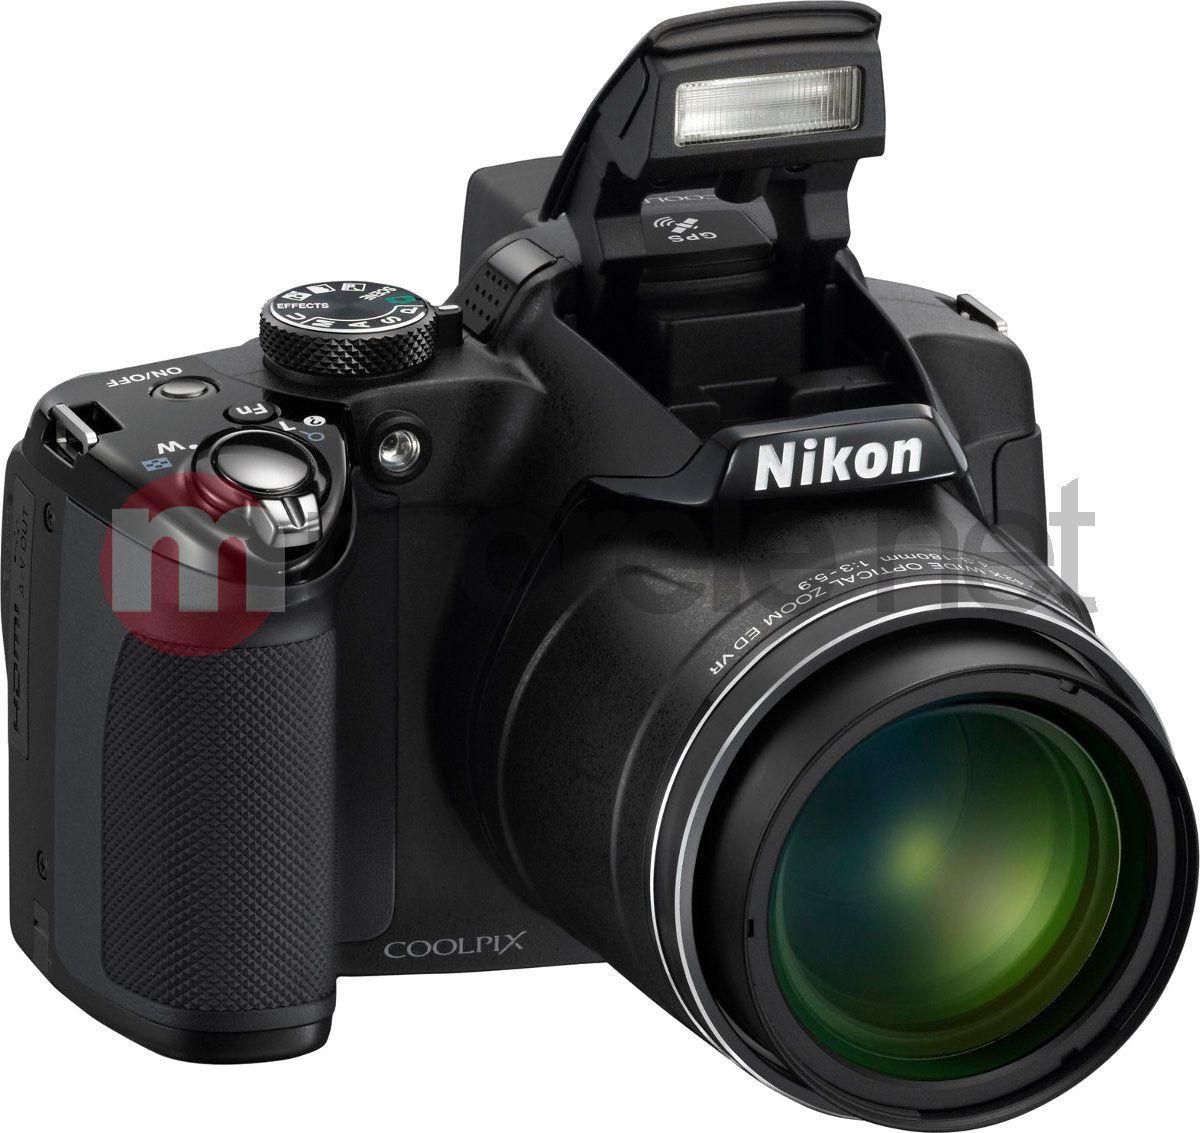 Aparat cyfrowy Nikon CoolPix P 510 (VMA911E1) czarny